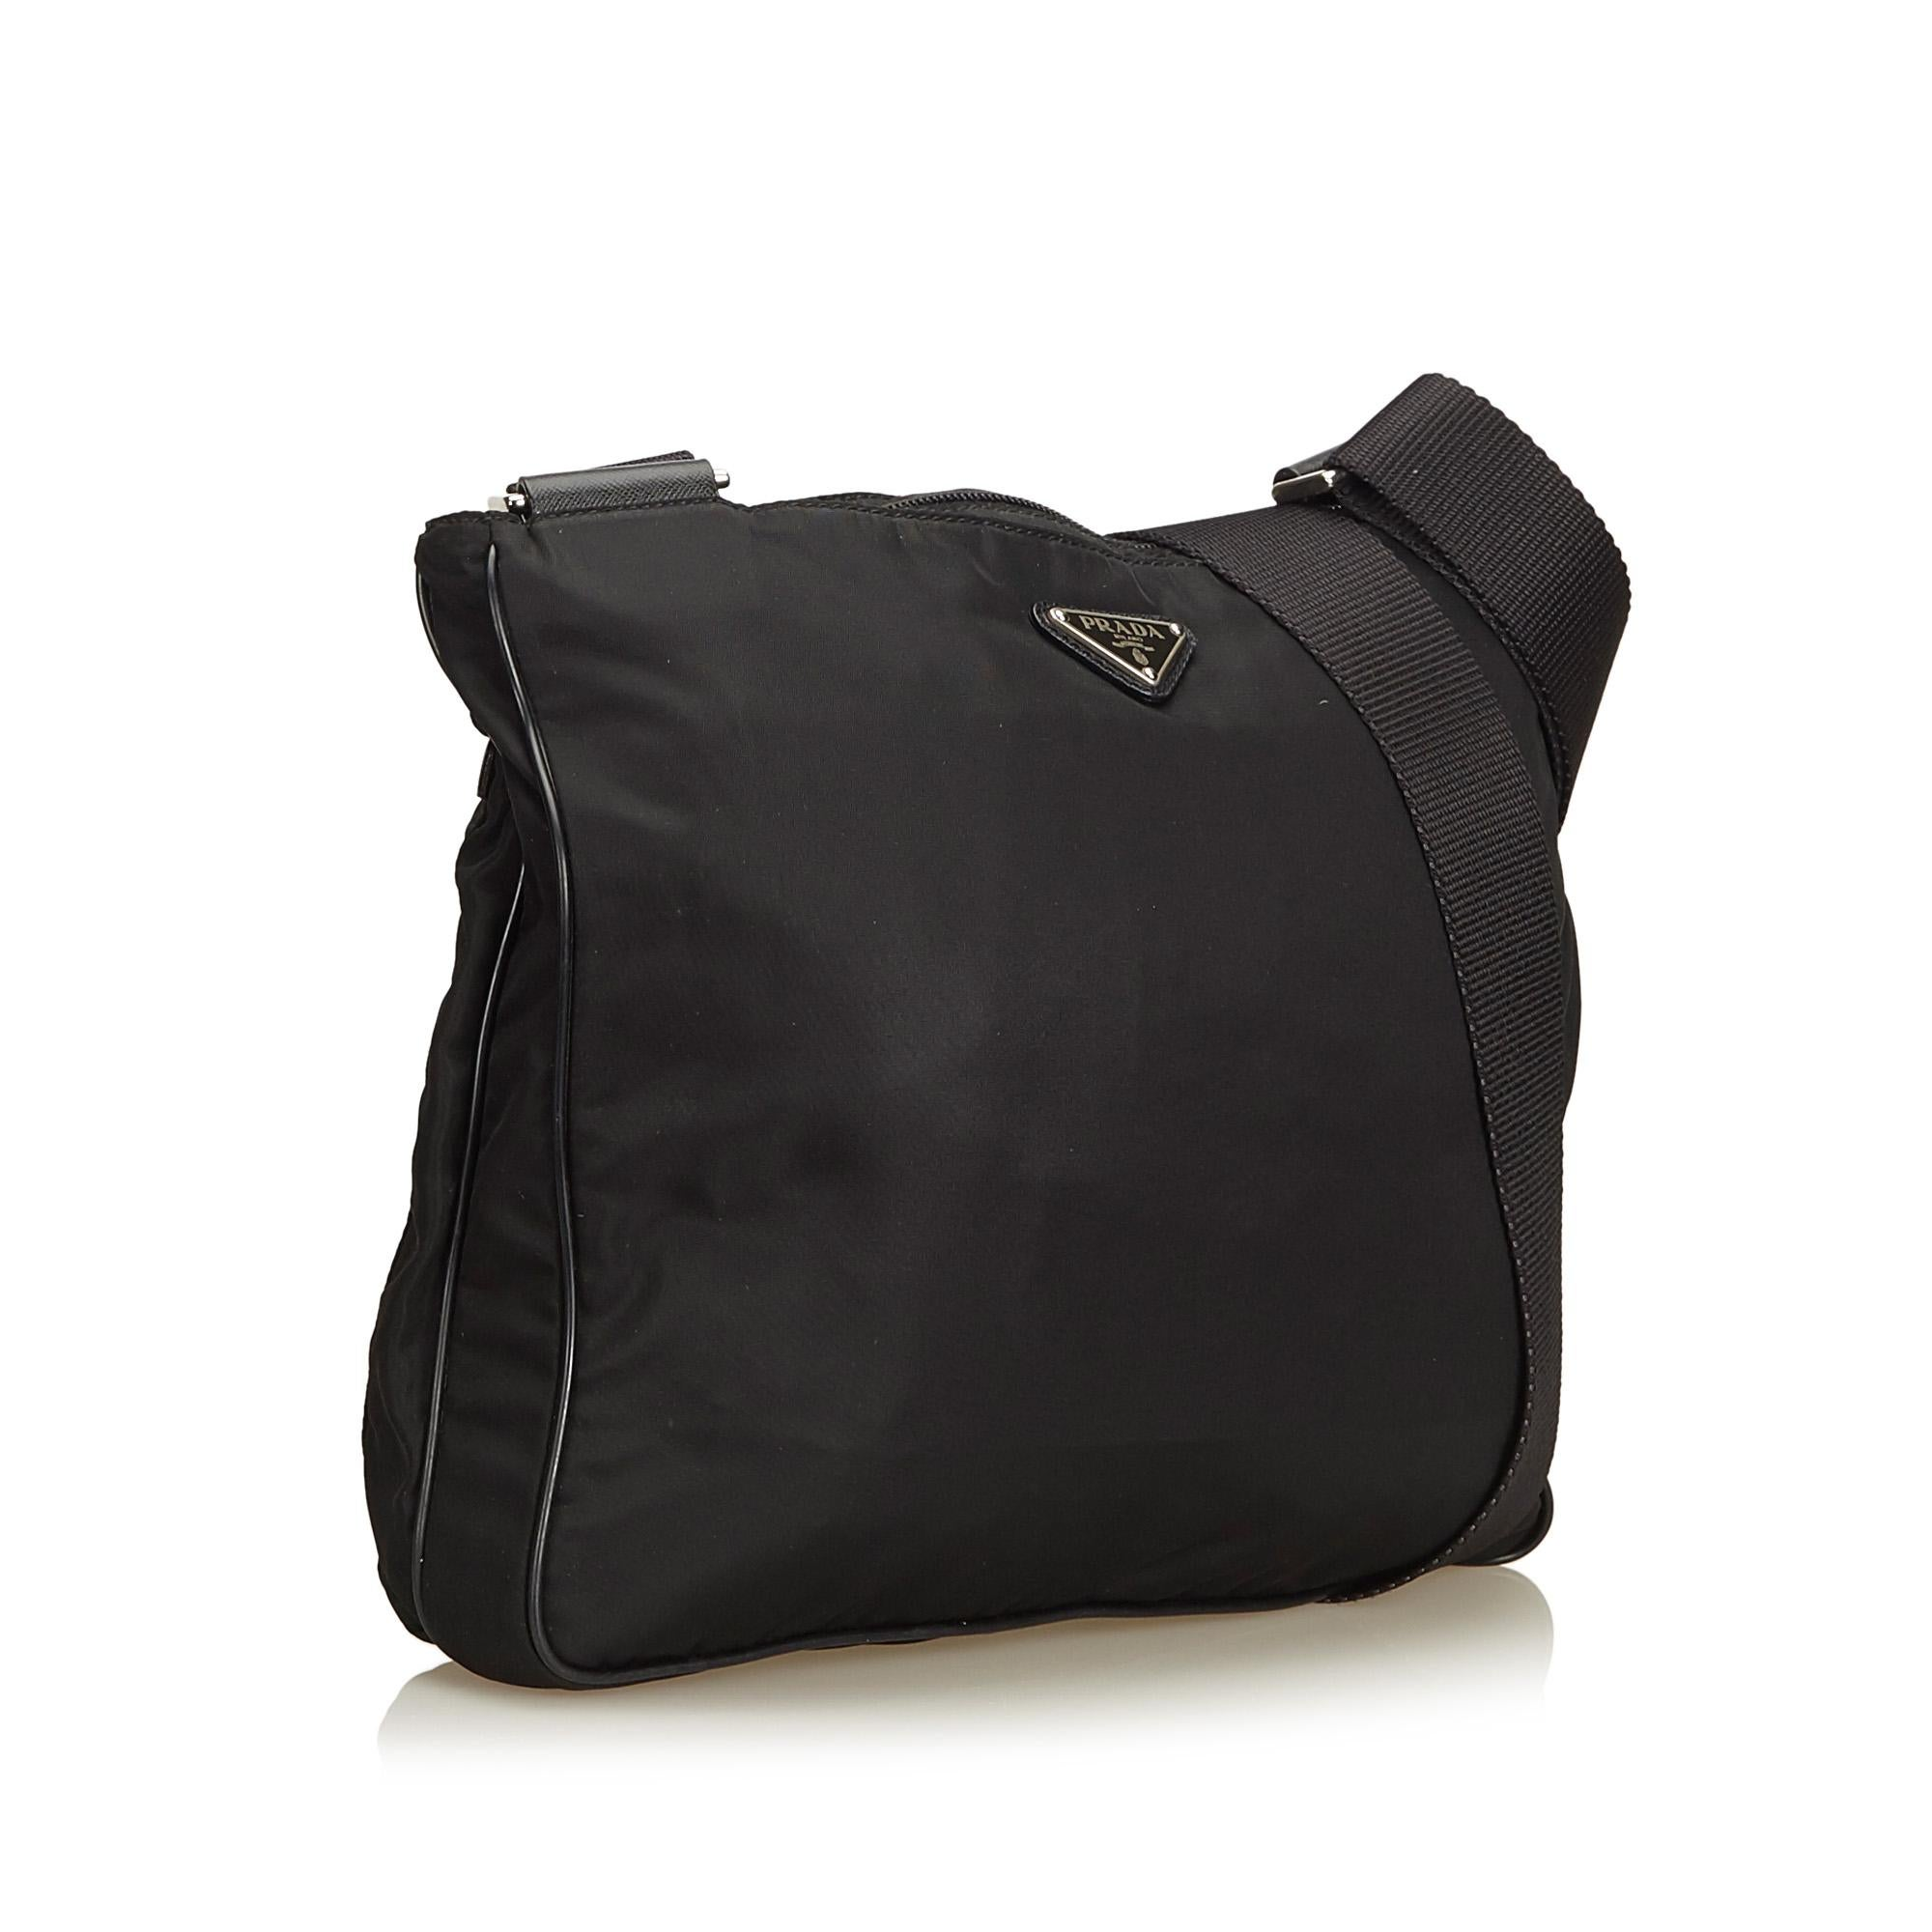 c38d1e701d07 Prada Black Tessuto Nylon Crossbody Bag